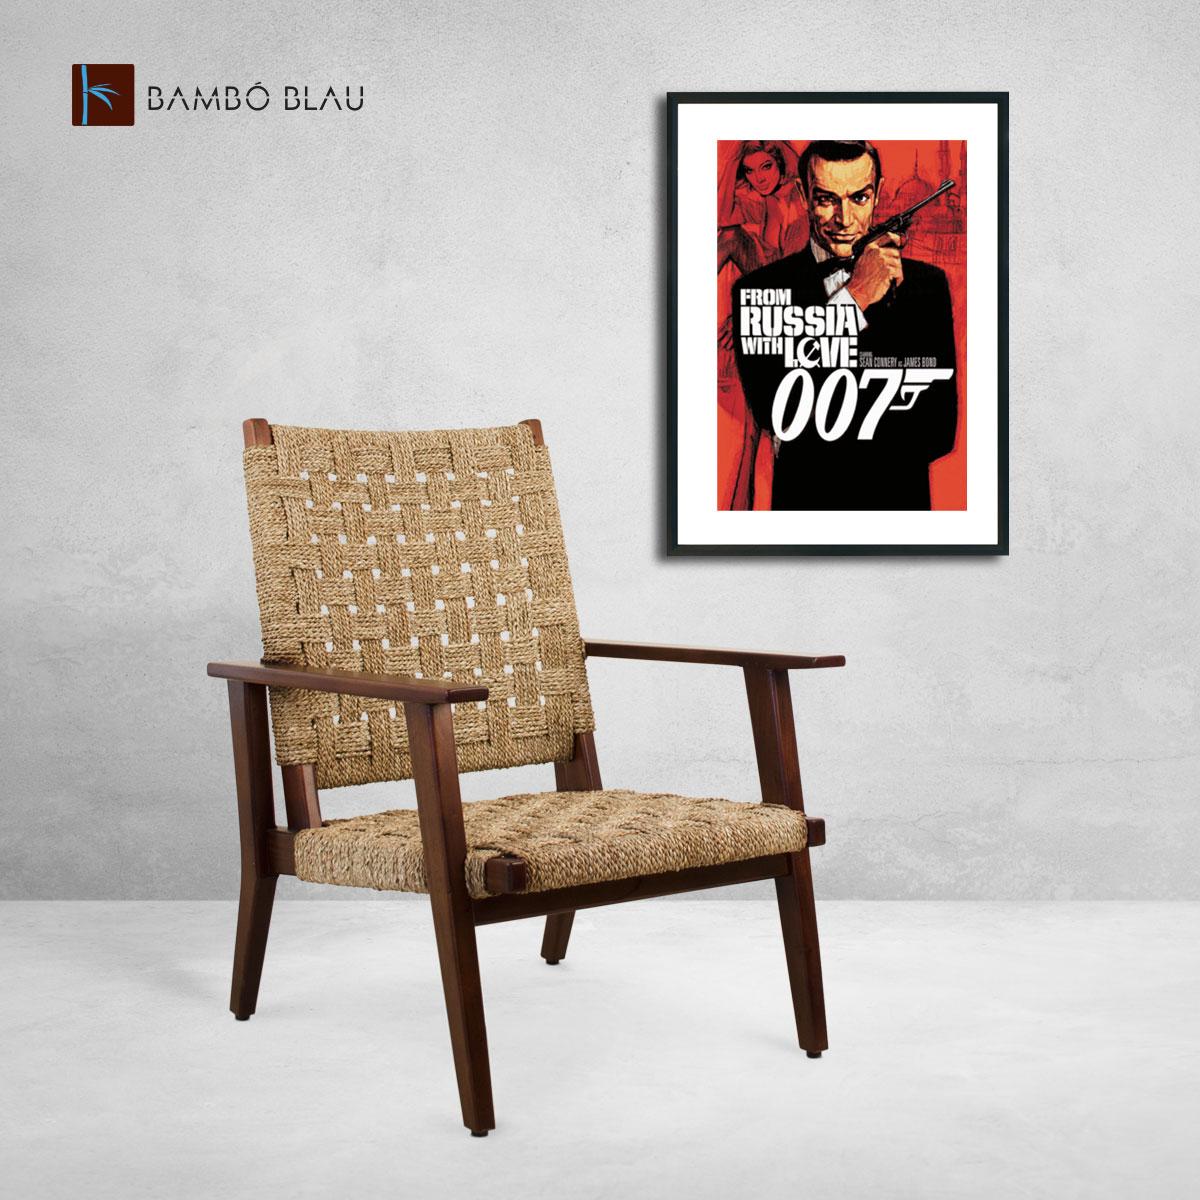 James Bond & Zermatt